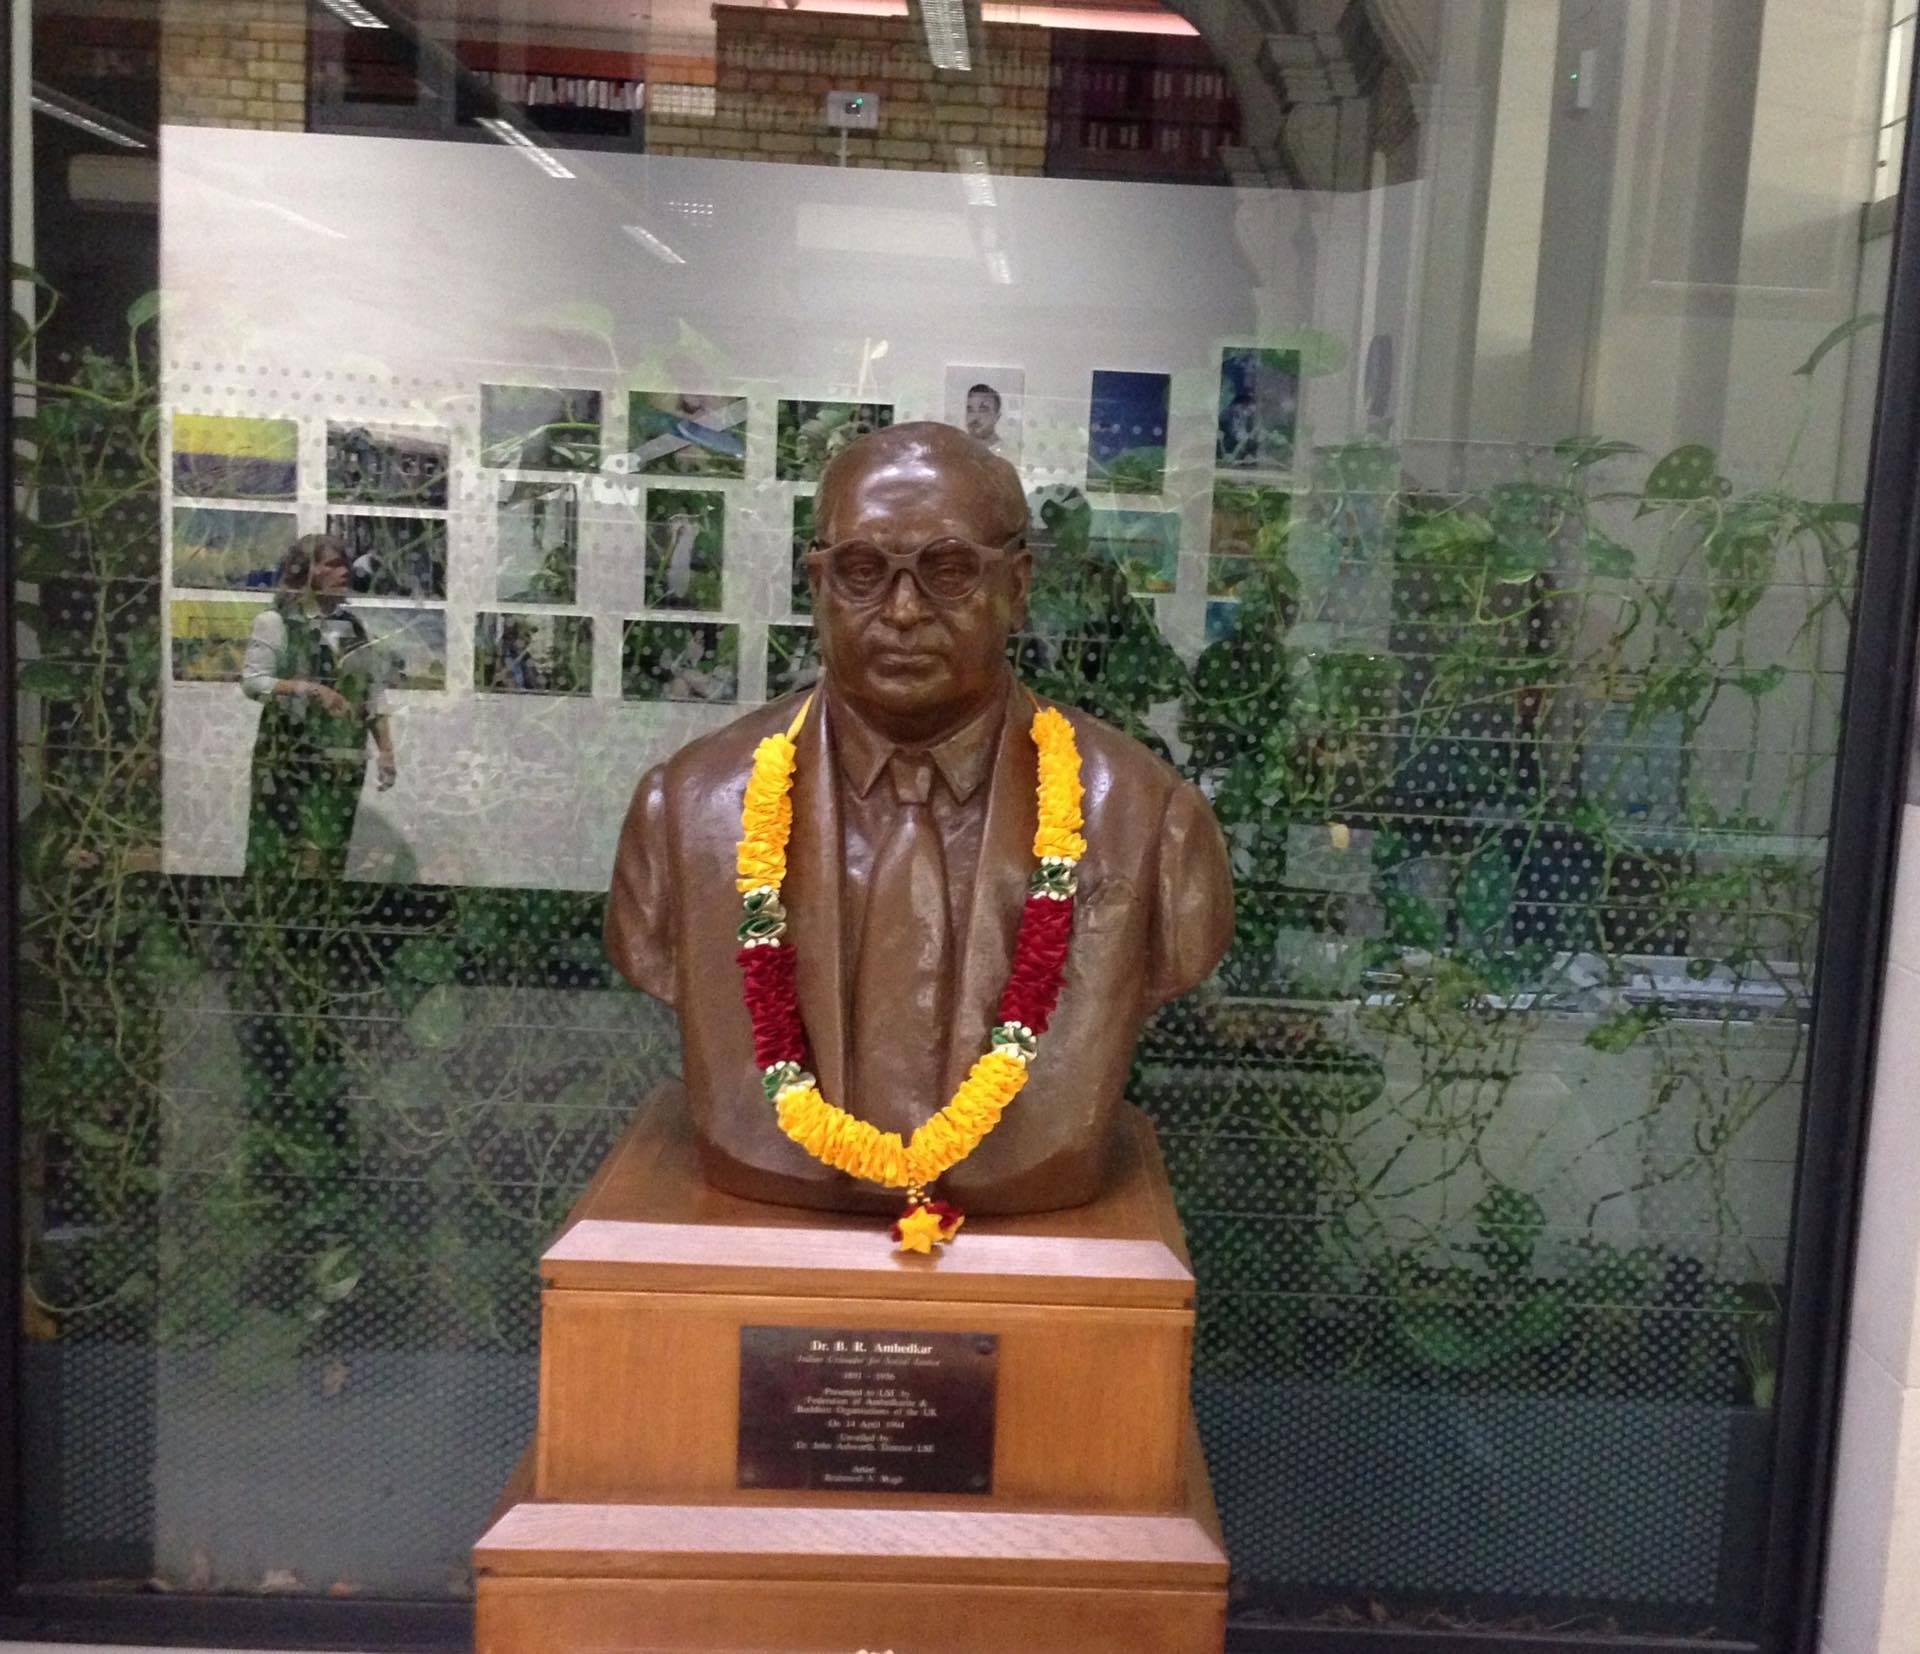 Ambedkar statue LSE